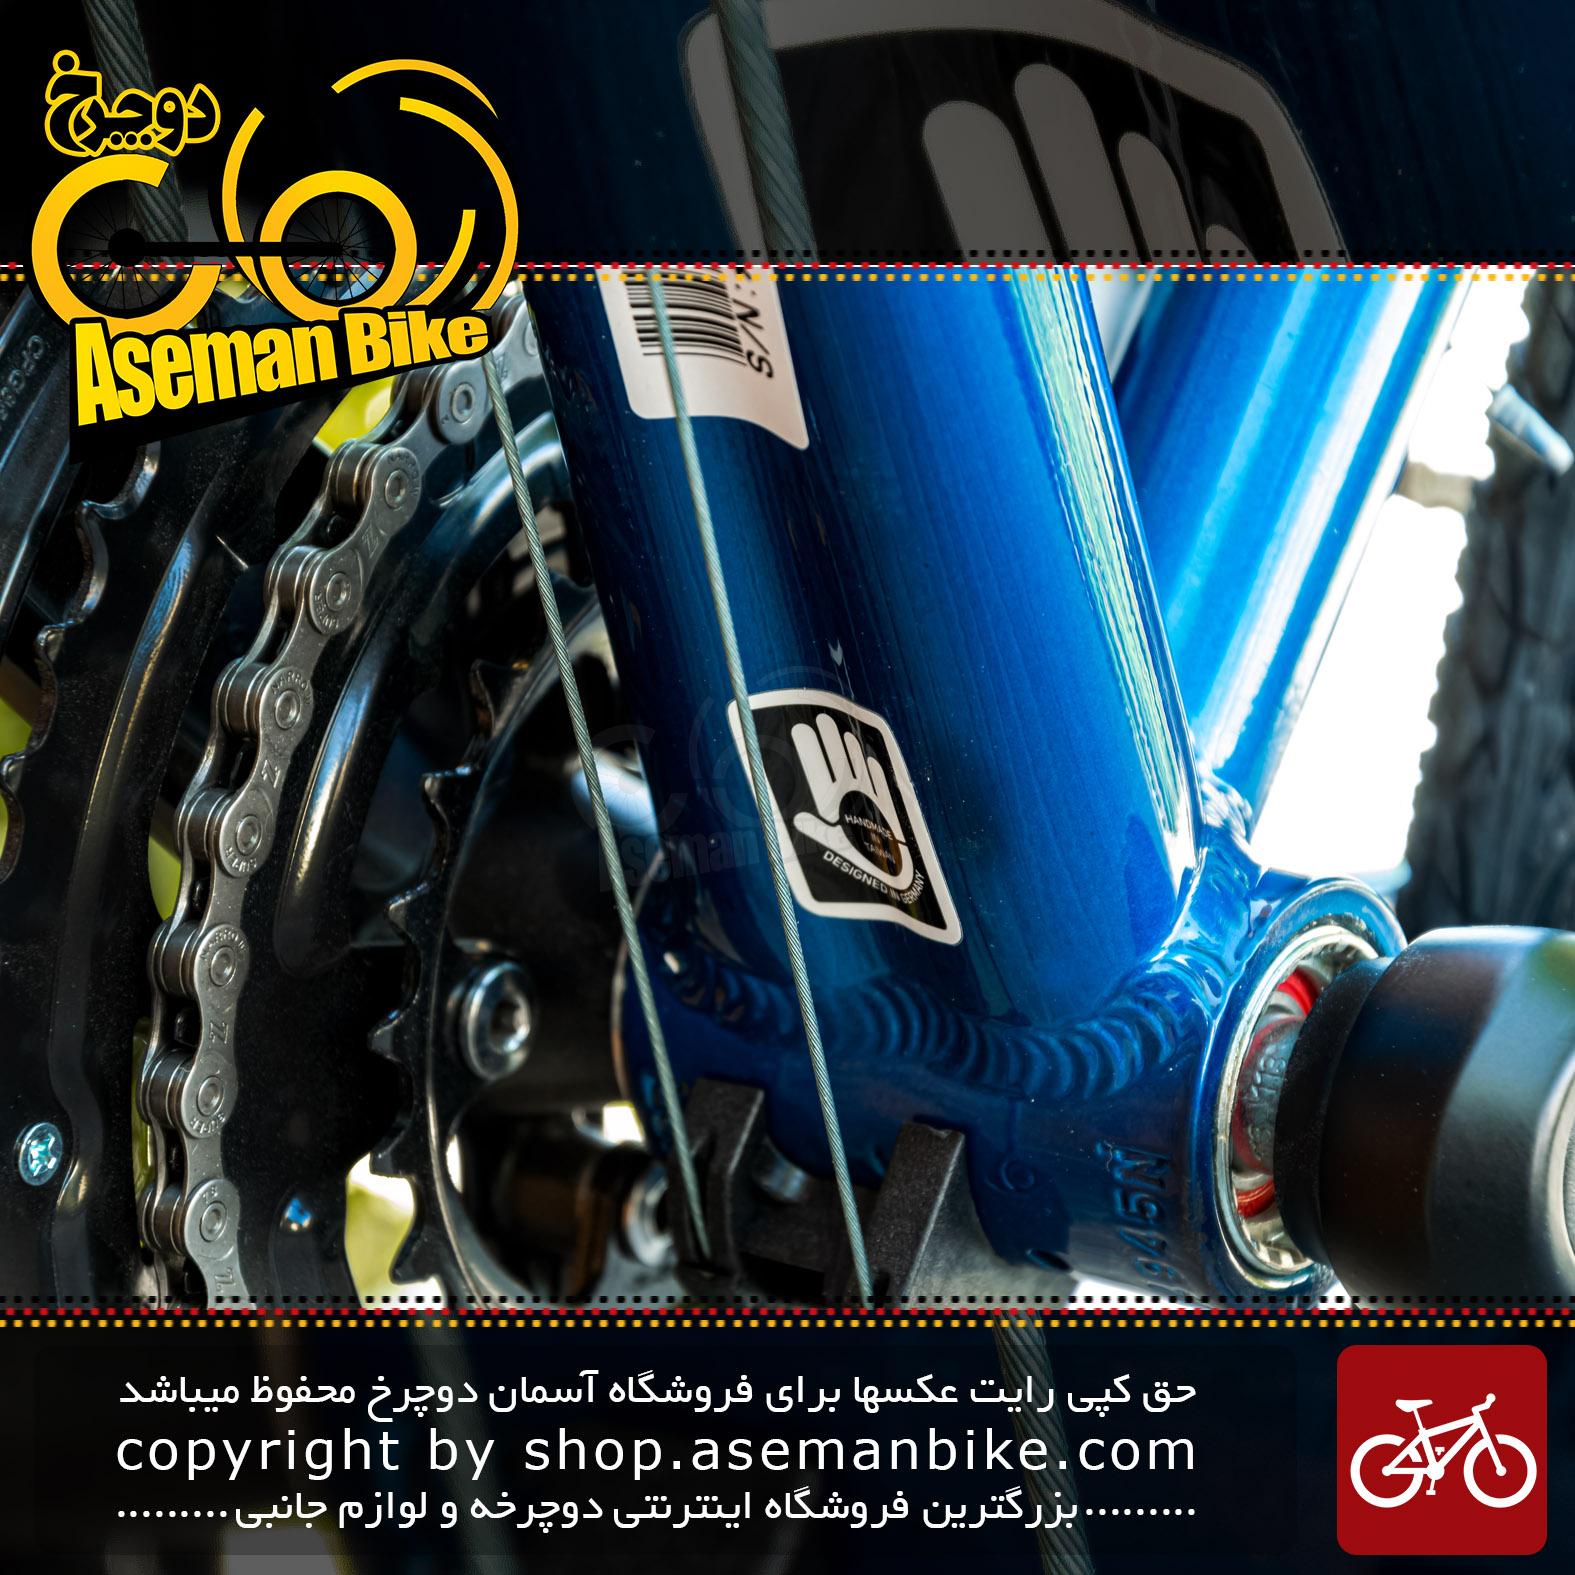 دوچرخه شهری توریستی مریدا مدل کراس وی اربان 40 دستساز تایوان طراحی آلمان سایز 28 رنگ آبی اقیانوسی 27 سرعته 2021 Merida Urban Tourist Bicycle Crossway Urban 40 27 Speed Size 28 Handmade in Taiwan Design Germany Ocean Blue 27 Speed 2021